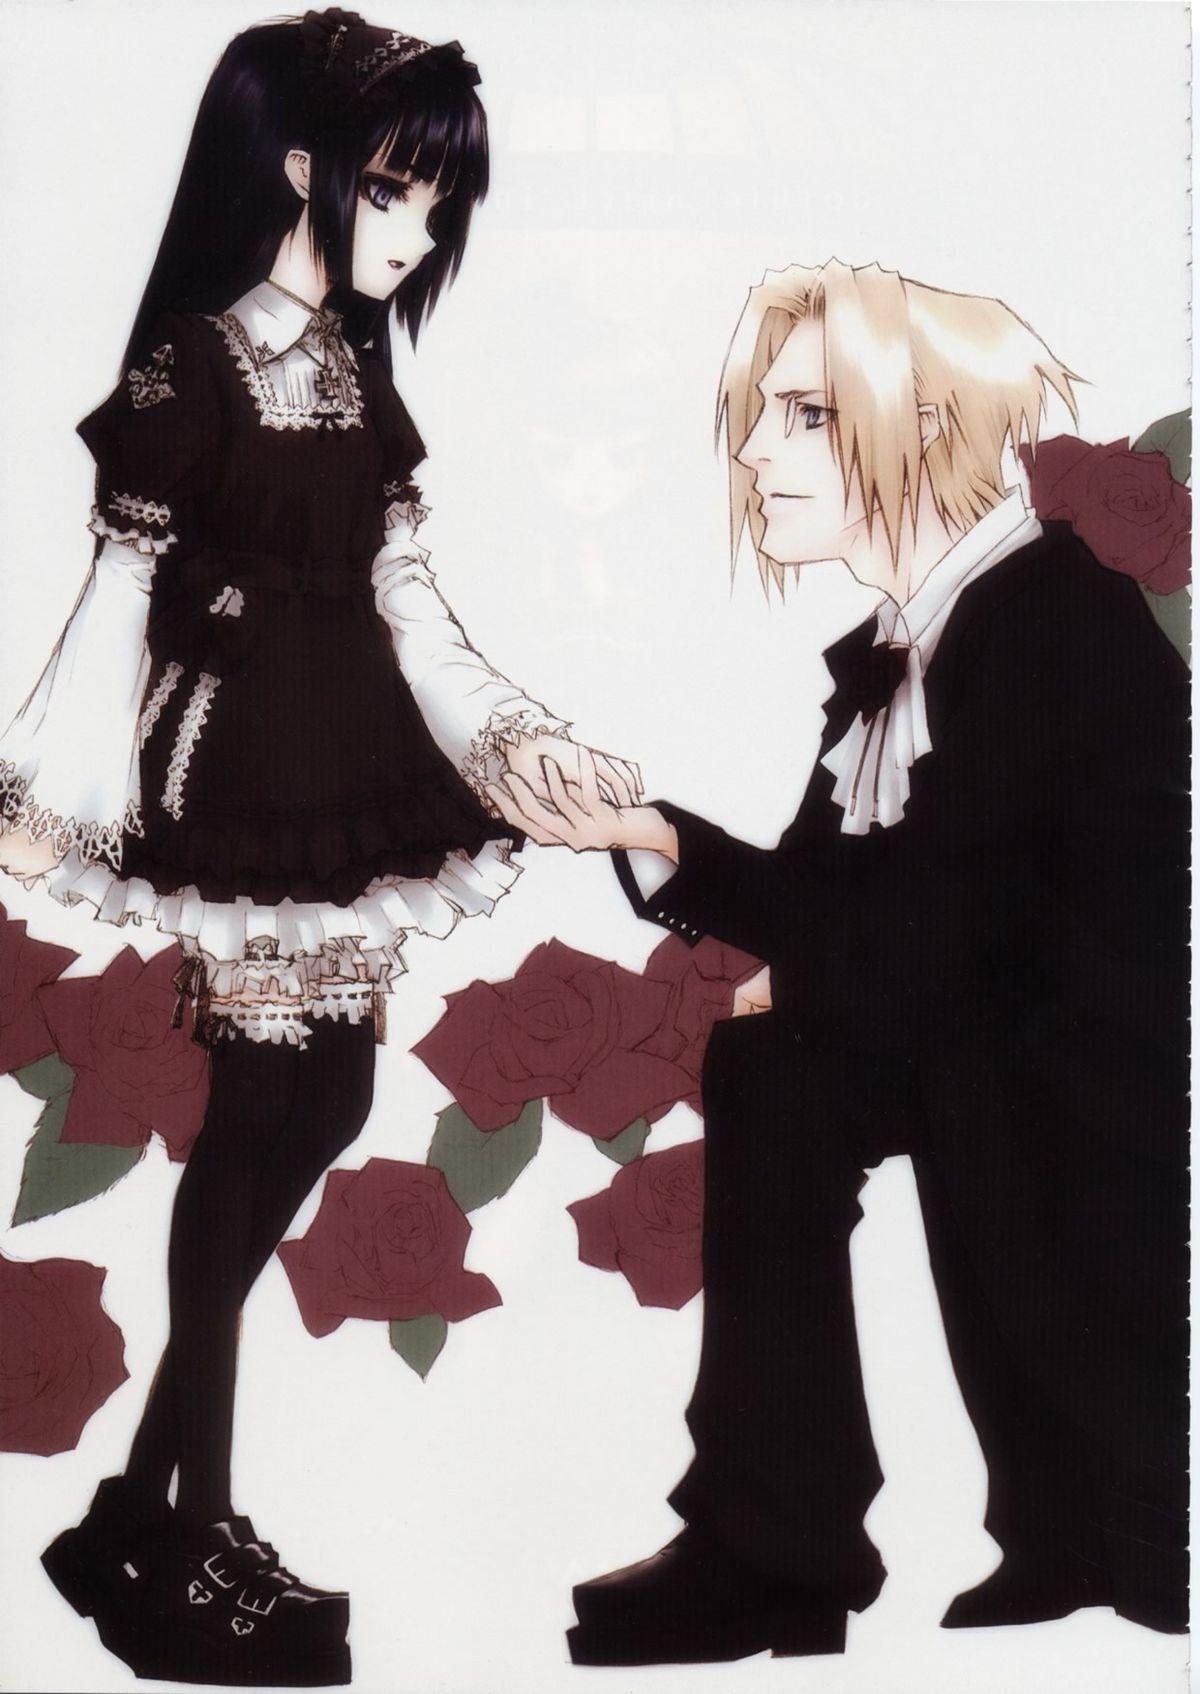 Cute Anime Couple Wallpaper For Iphone Closet Child Zerochan Anime Image Board